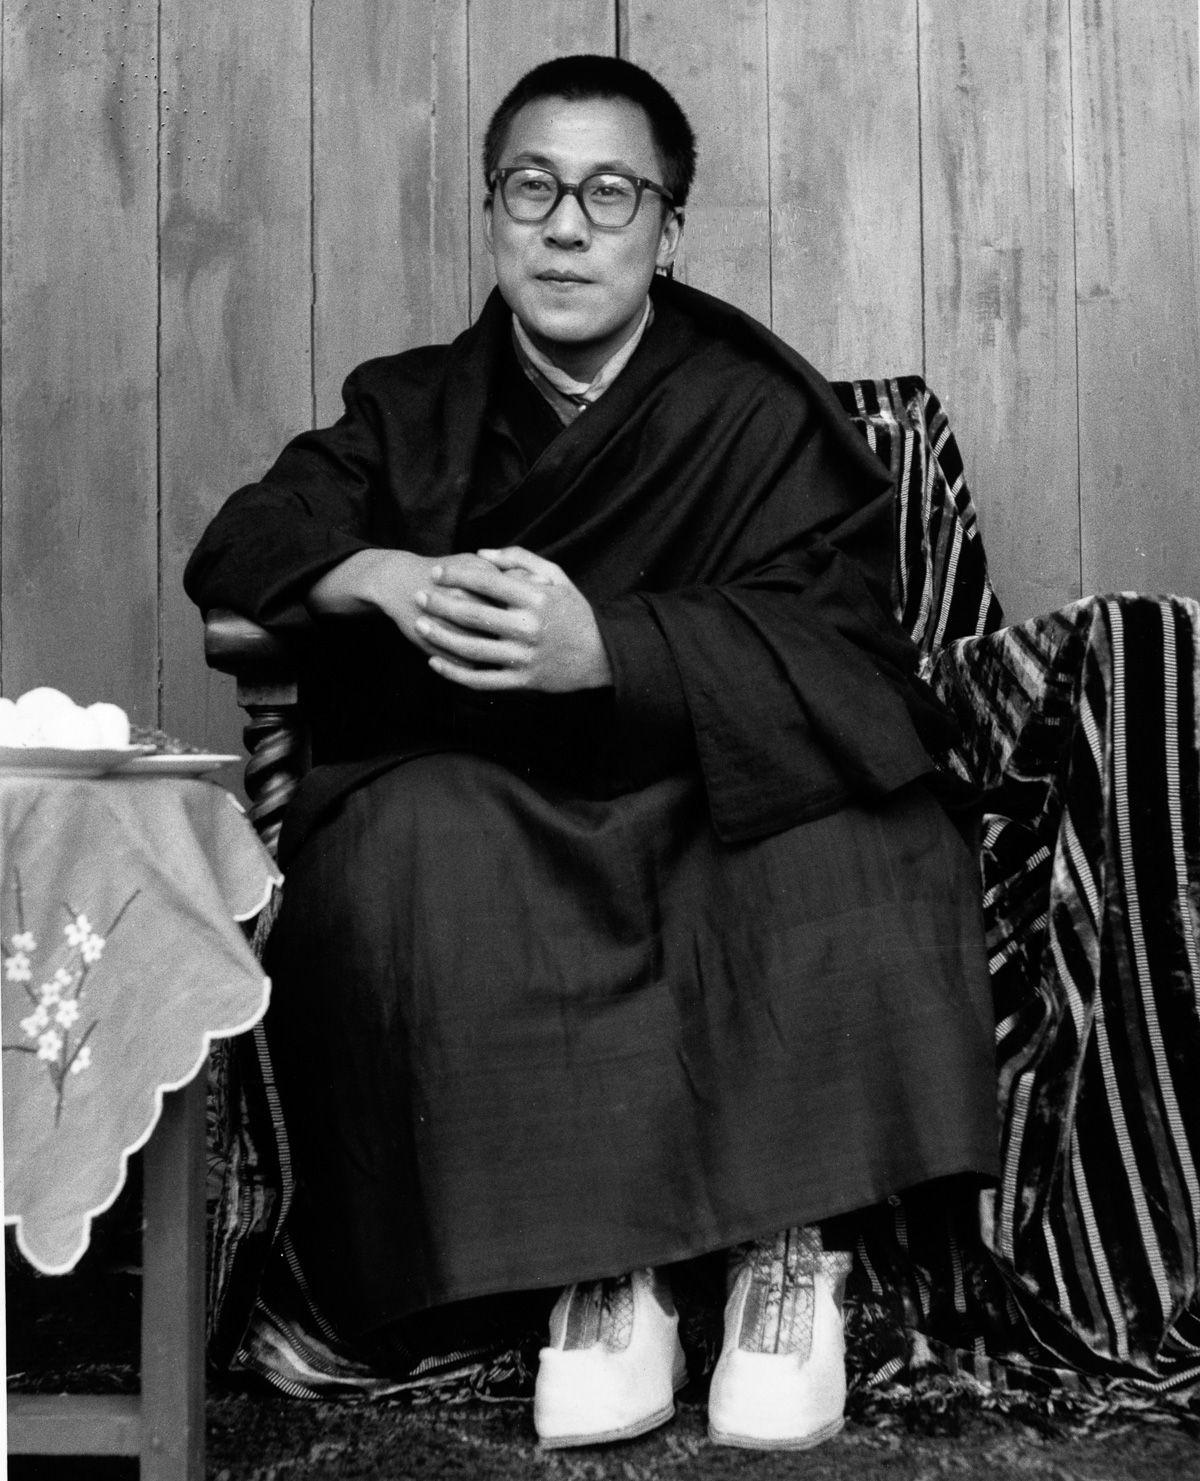 Dalai Lama turns 80: How the young spiritual leader came of